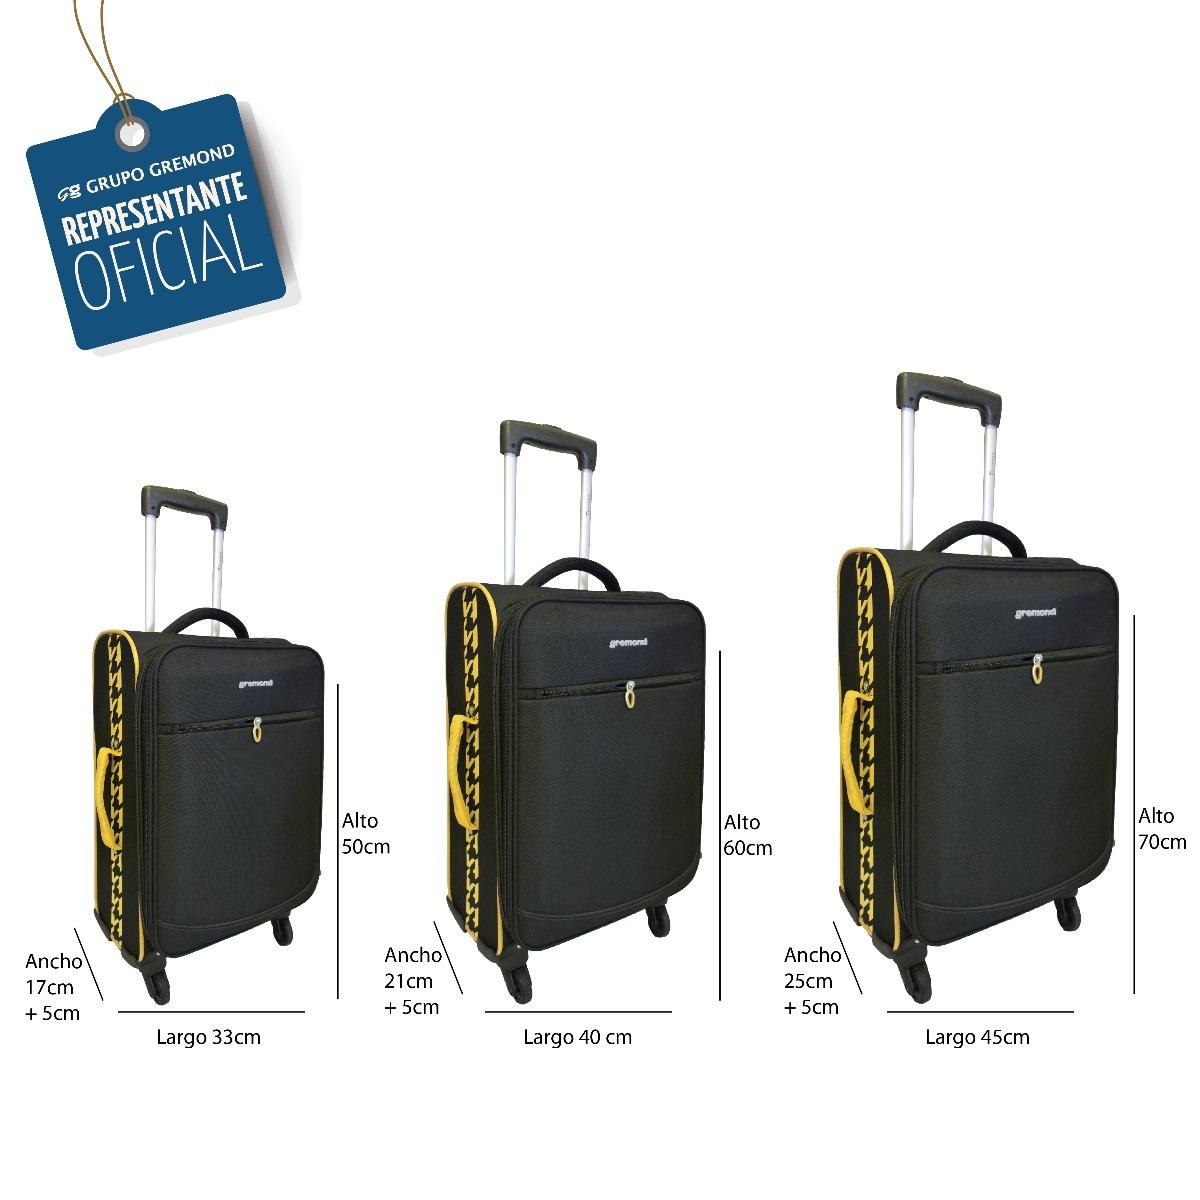 9007069e9 set 3 valijas grande mediana cabina transit gremond maletas. Cargando zoom.